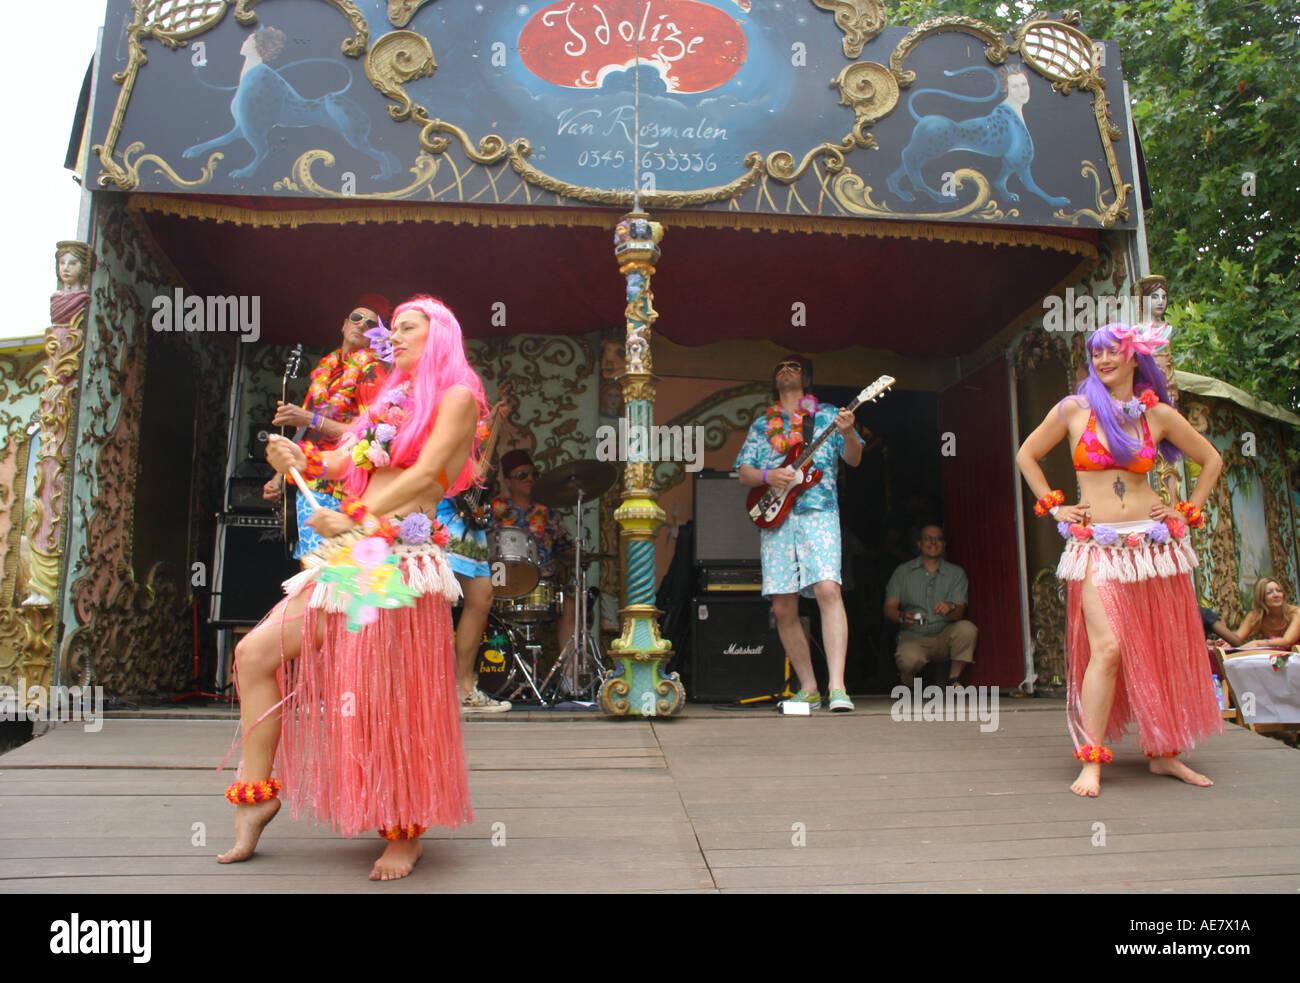 a Hawaiian style band perform at lovebox festival victoria park london july 2005 - Stock Image